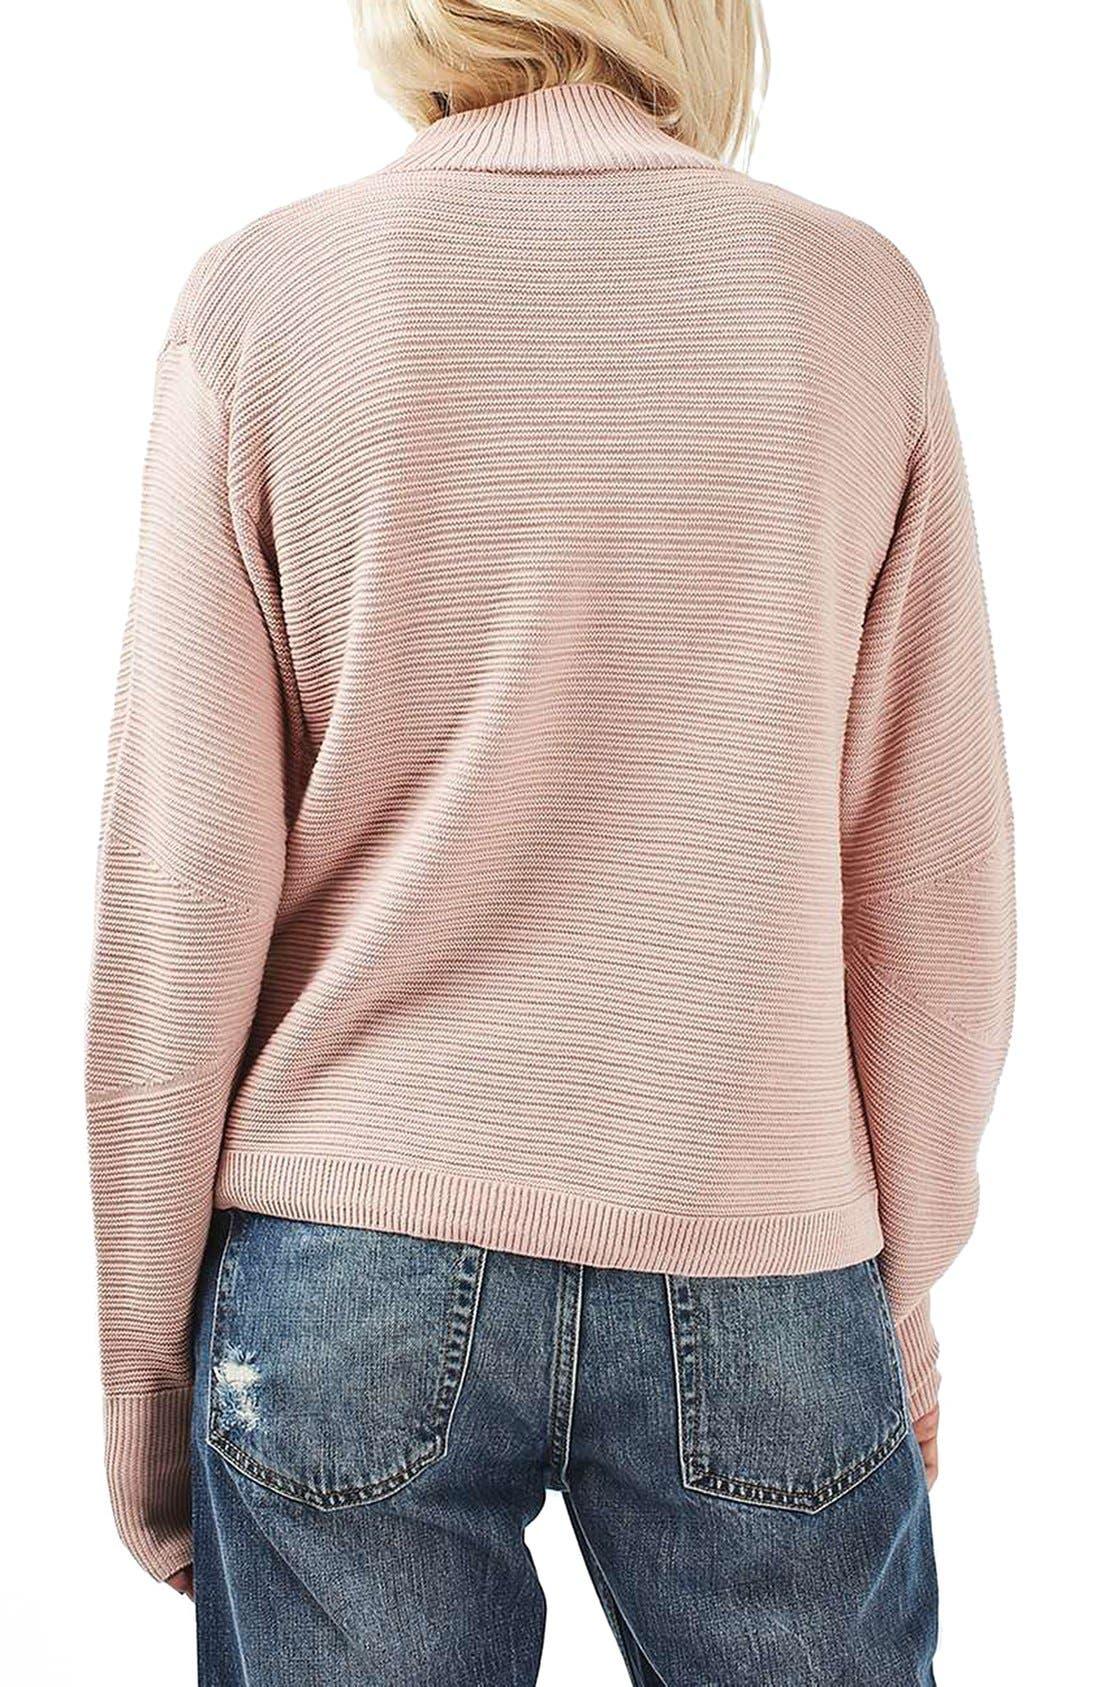 Alternate Image 3  - Topshop Mixed Stitch Sweater